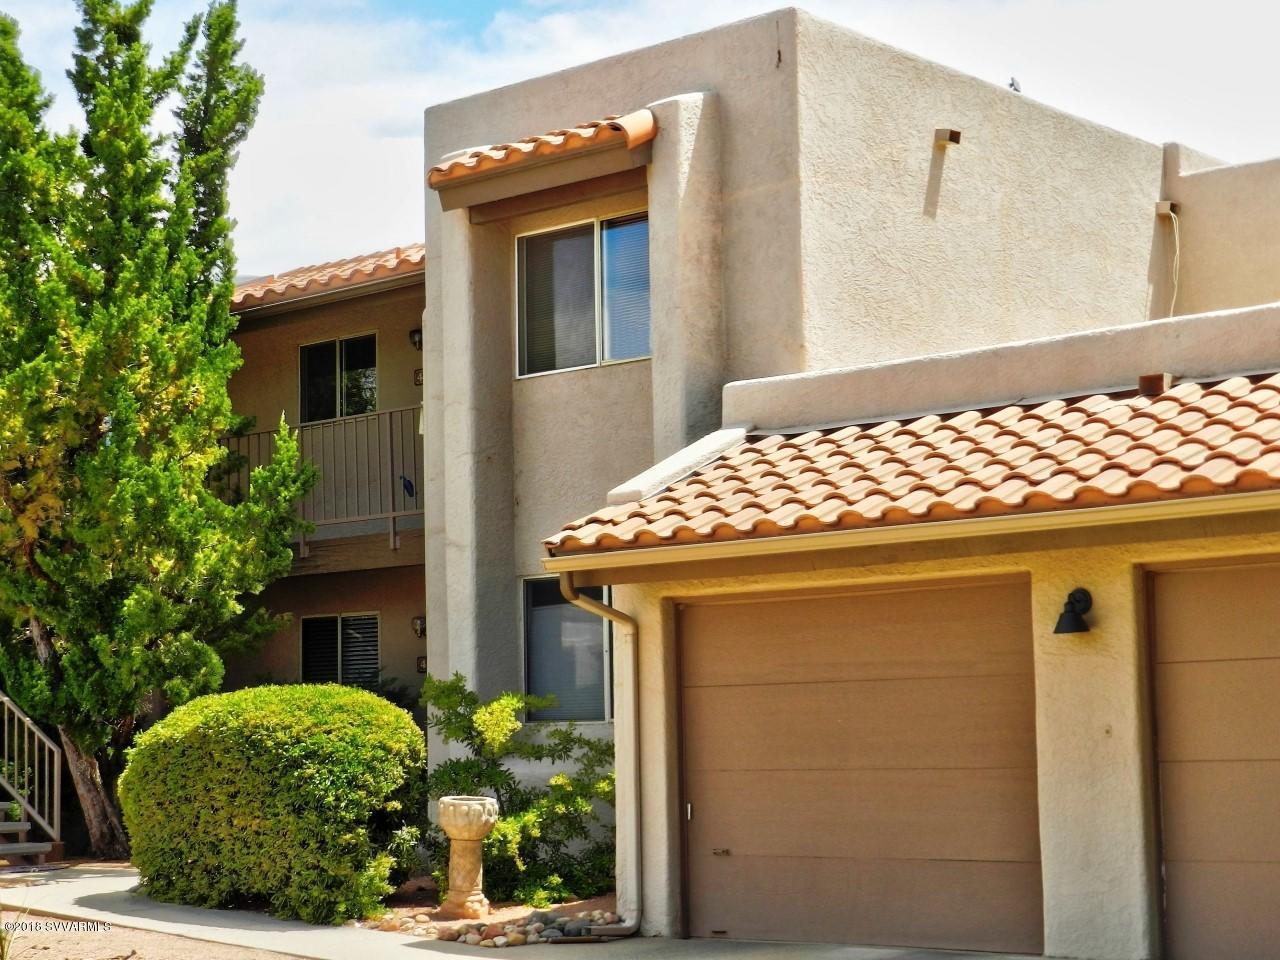 46 Tanager Lane #46 Sedona, AZ 86336